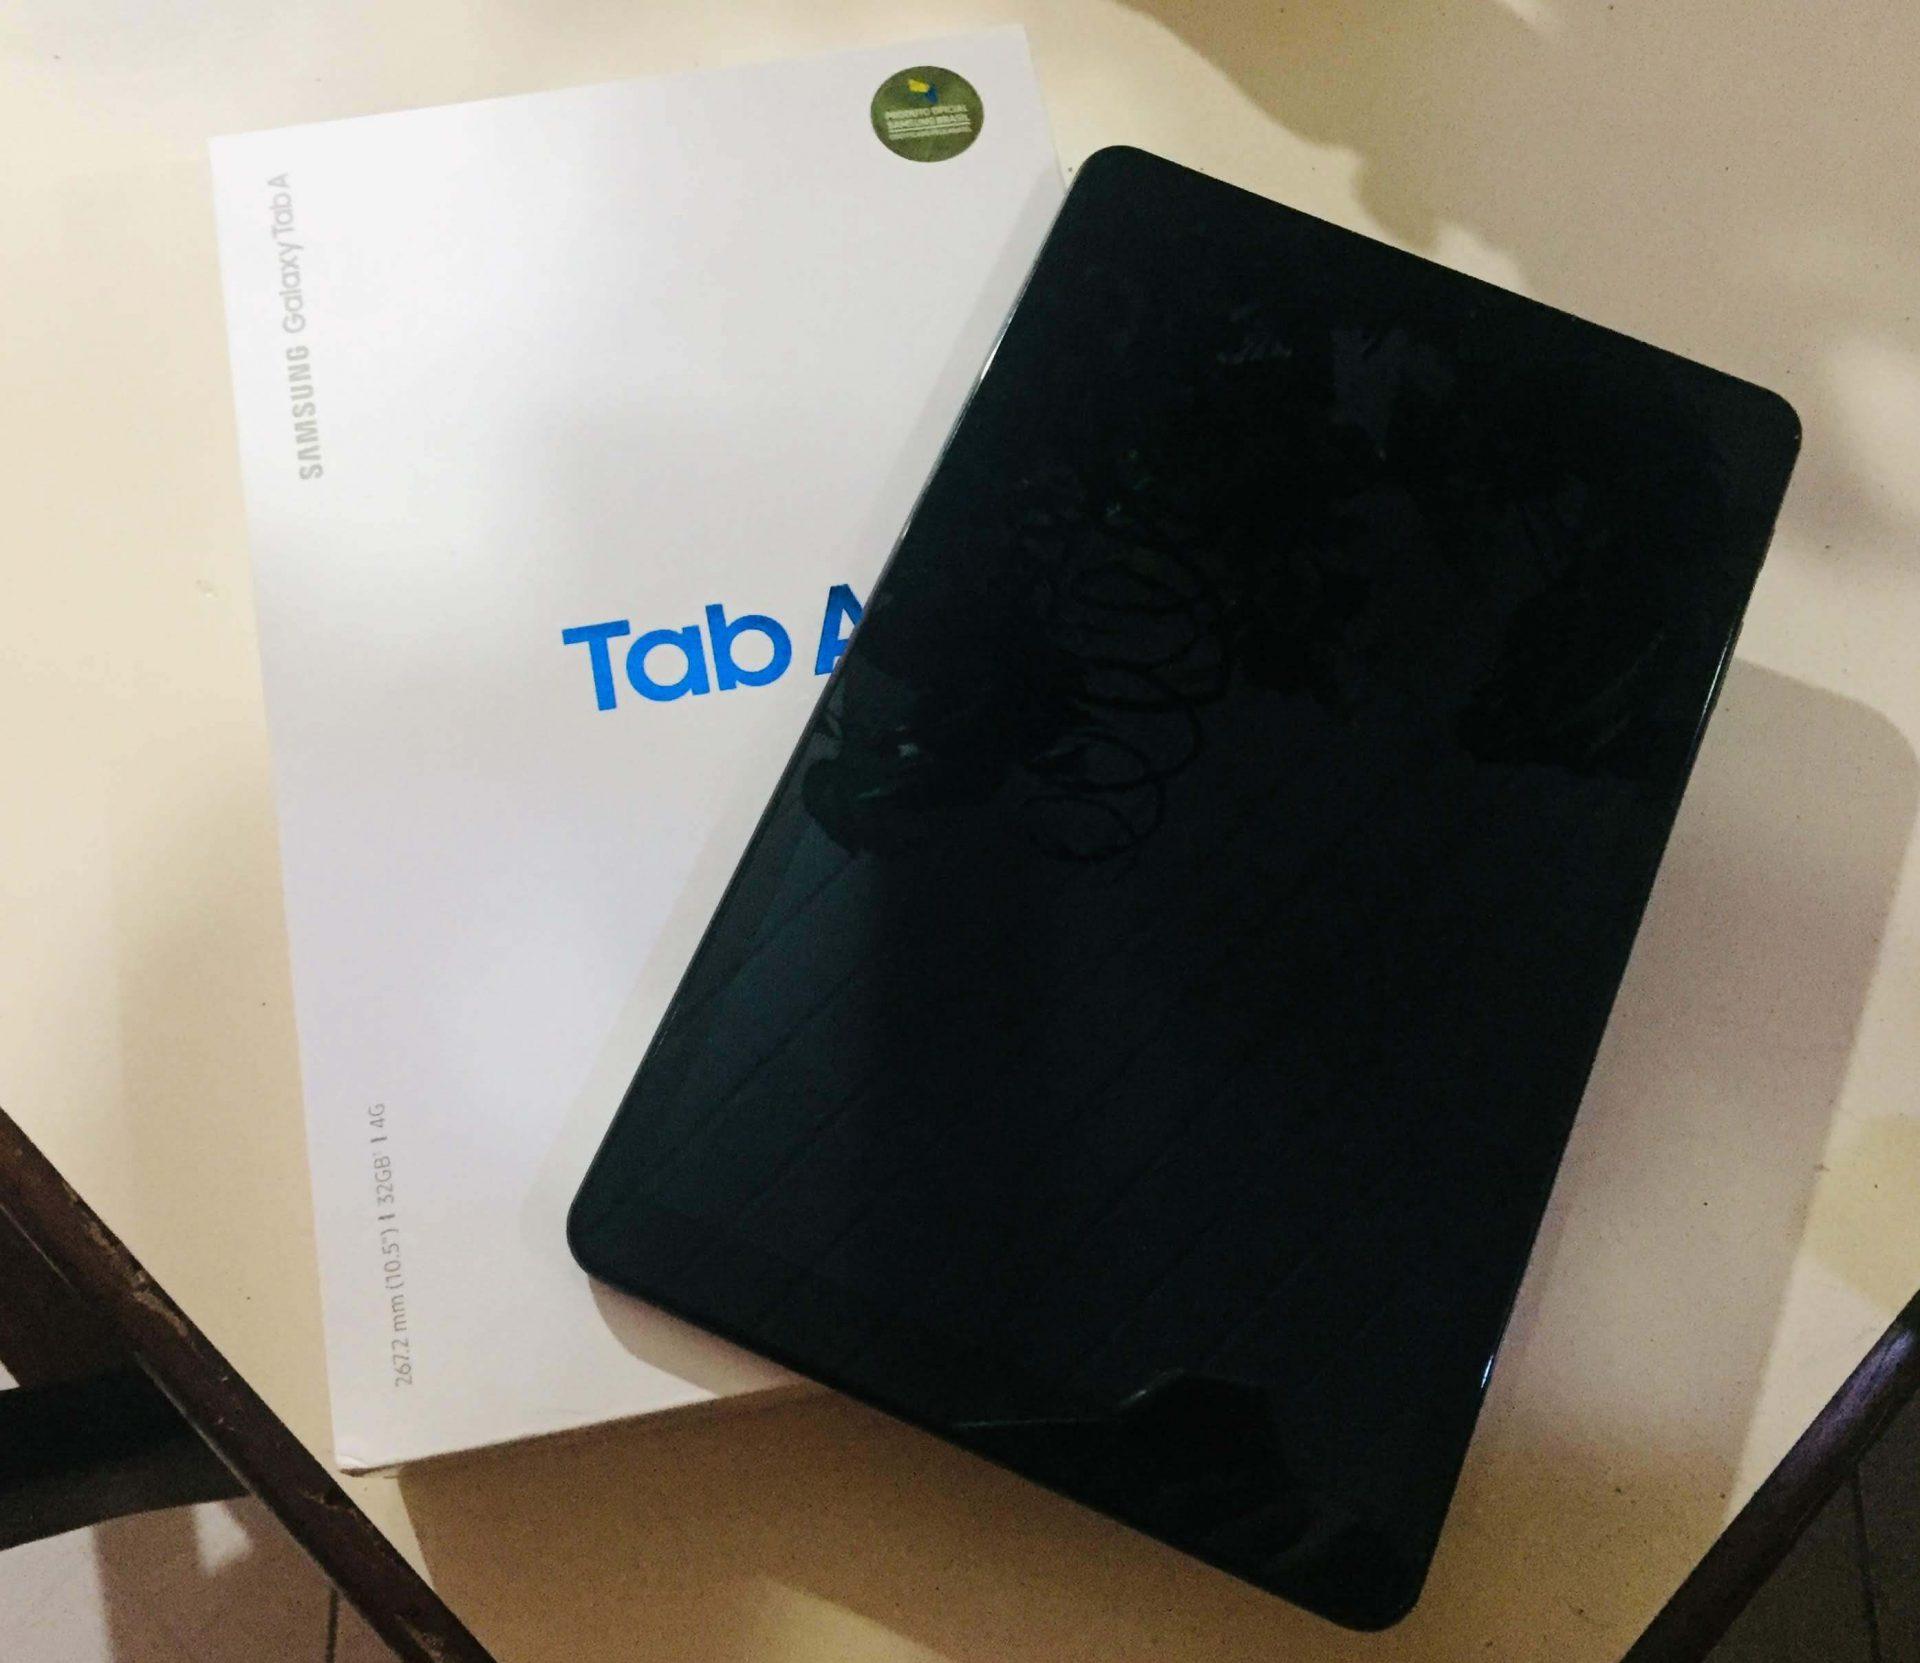 IMG 1190 - Review: Samsung Galaxy Tab A, o tablet perfeito para uso no dia-a-dia